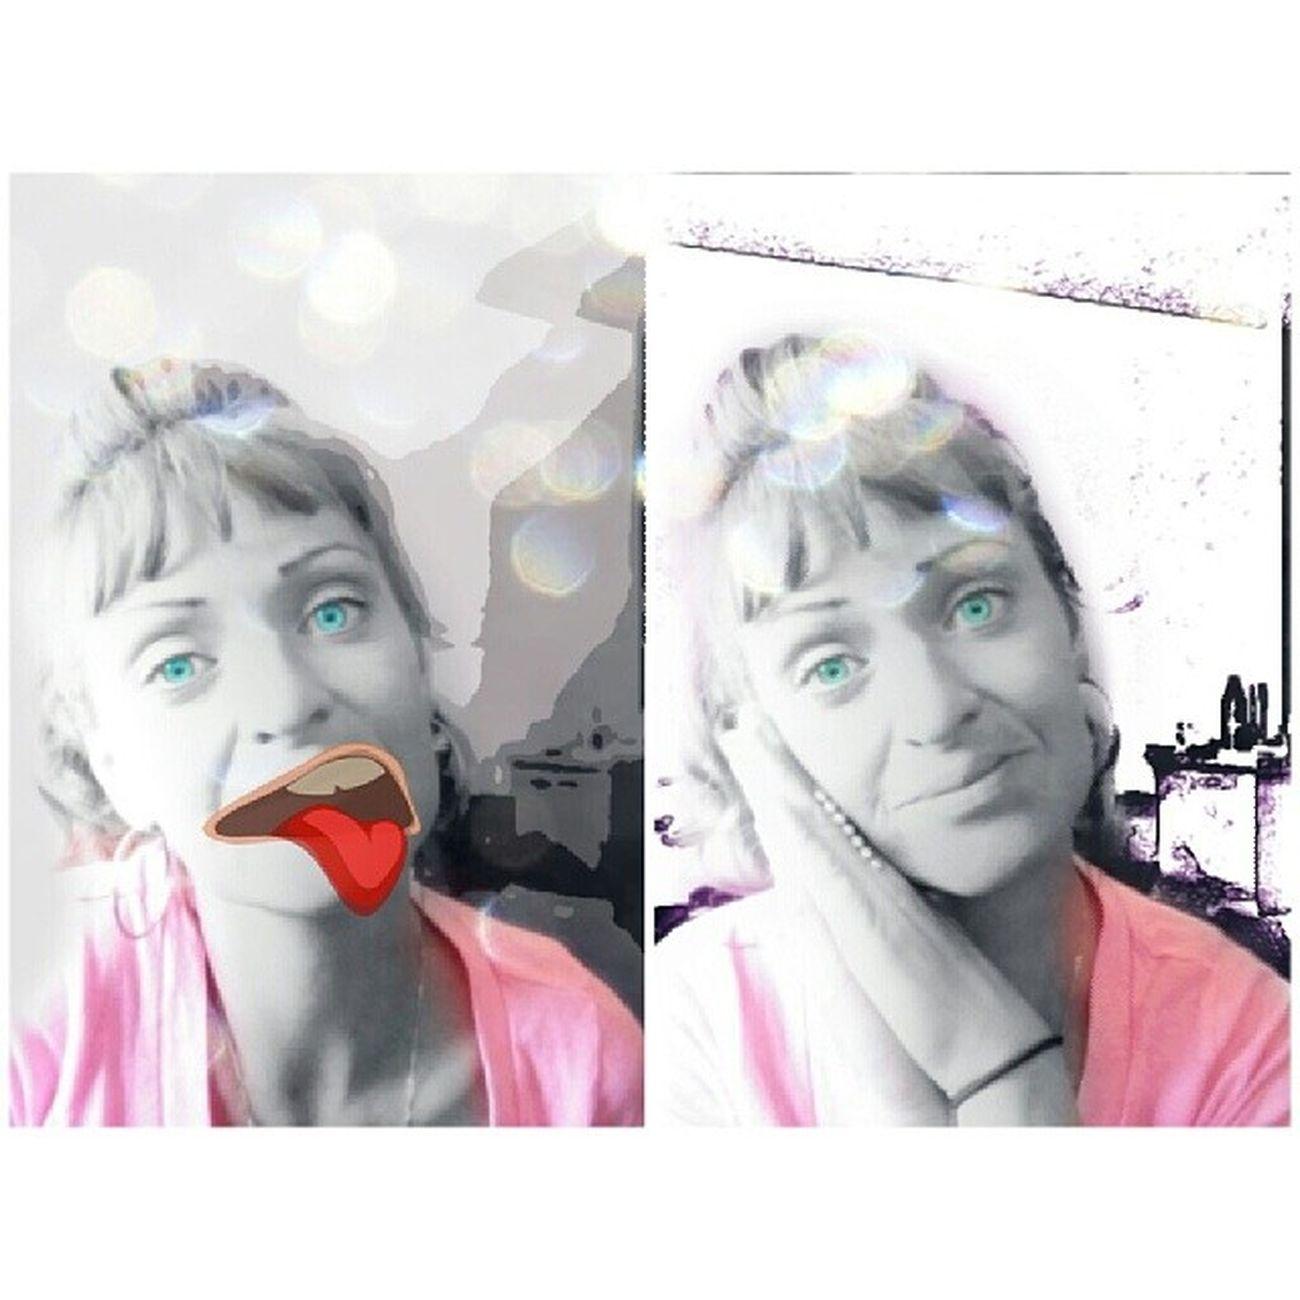 Blah Selfie Belife Silly funny picoftheday like love loveliest cartoon photooftheday iloveyou gorgeous bestoftheday beautiful eternal alien grunge like bosslady pinup pink softgoth softgrunge grunge ghost happygirl pretty bumpedmyhead AnotherDimension addiction